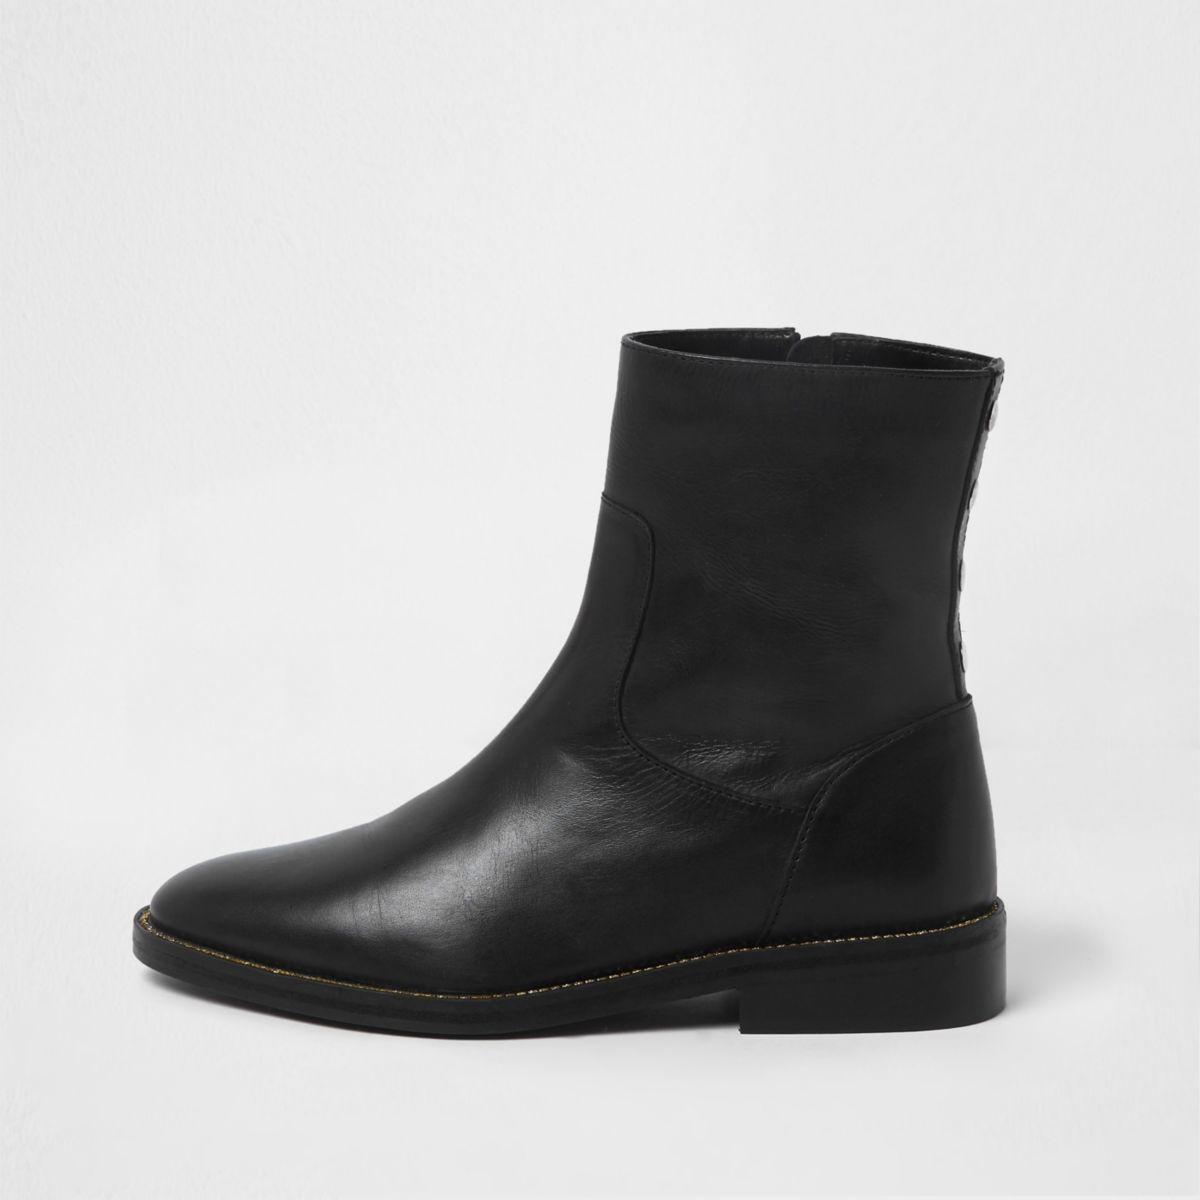 Black leather diamante trim ankle boots